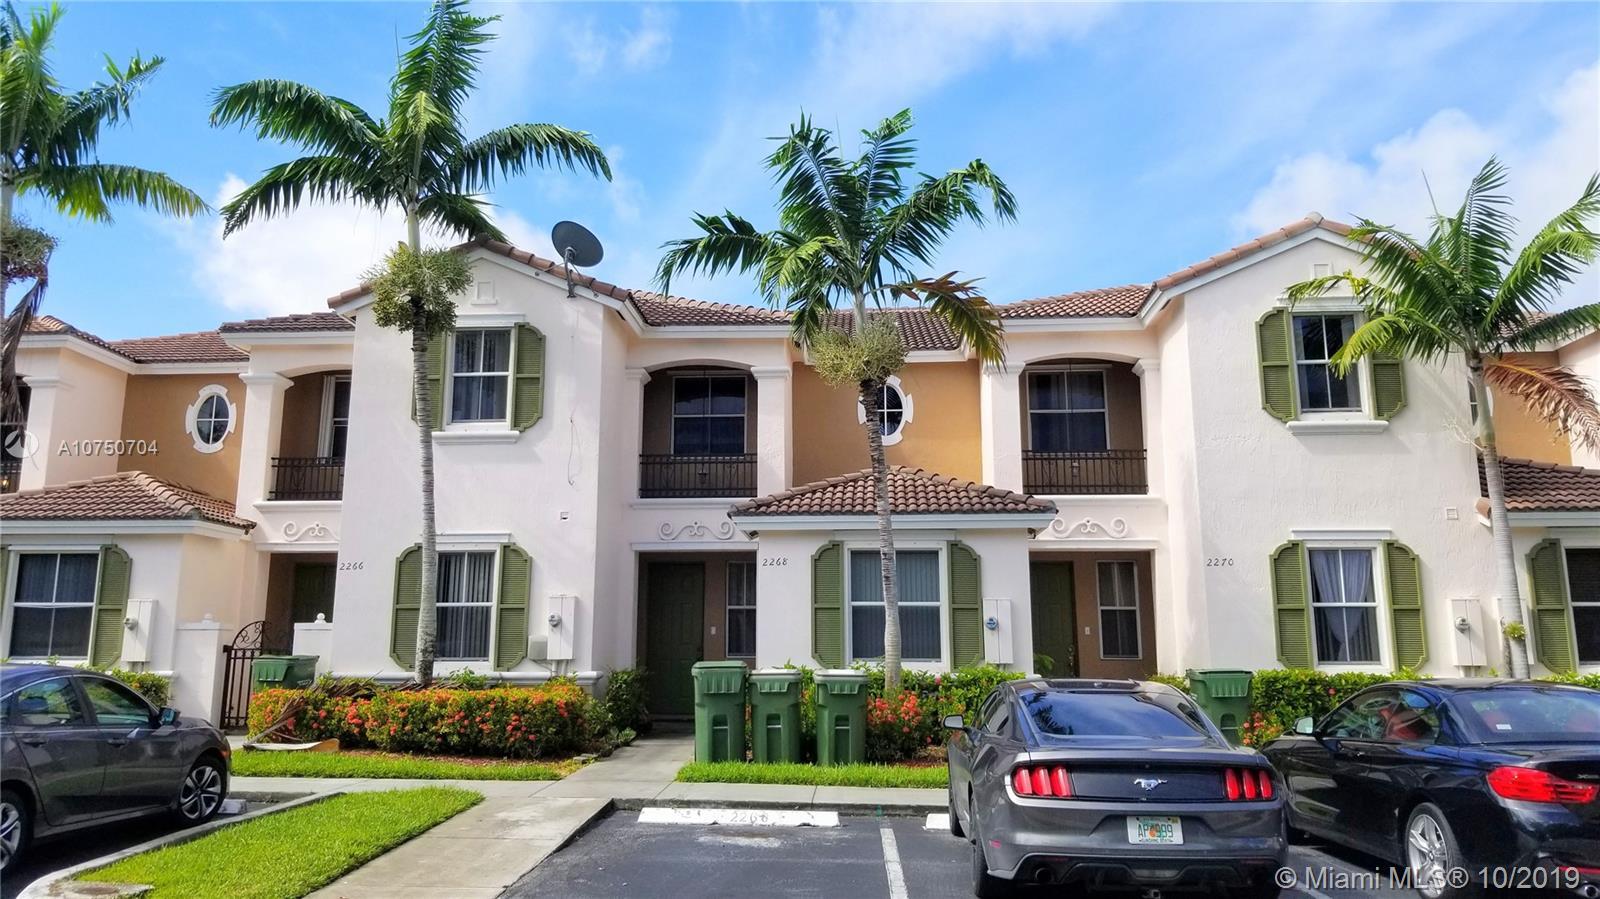 Marbella Cove Real Estate Listings Main Image